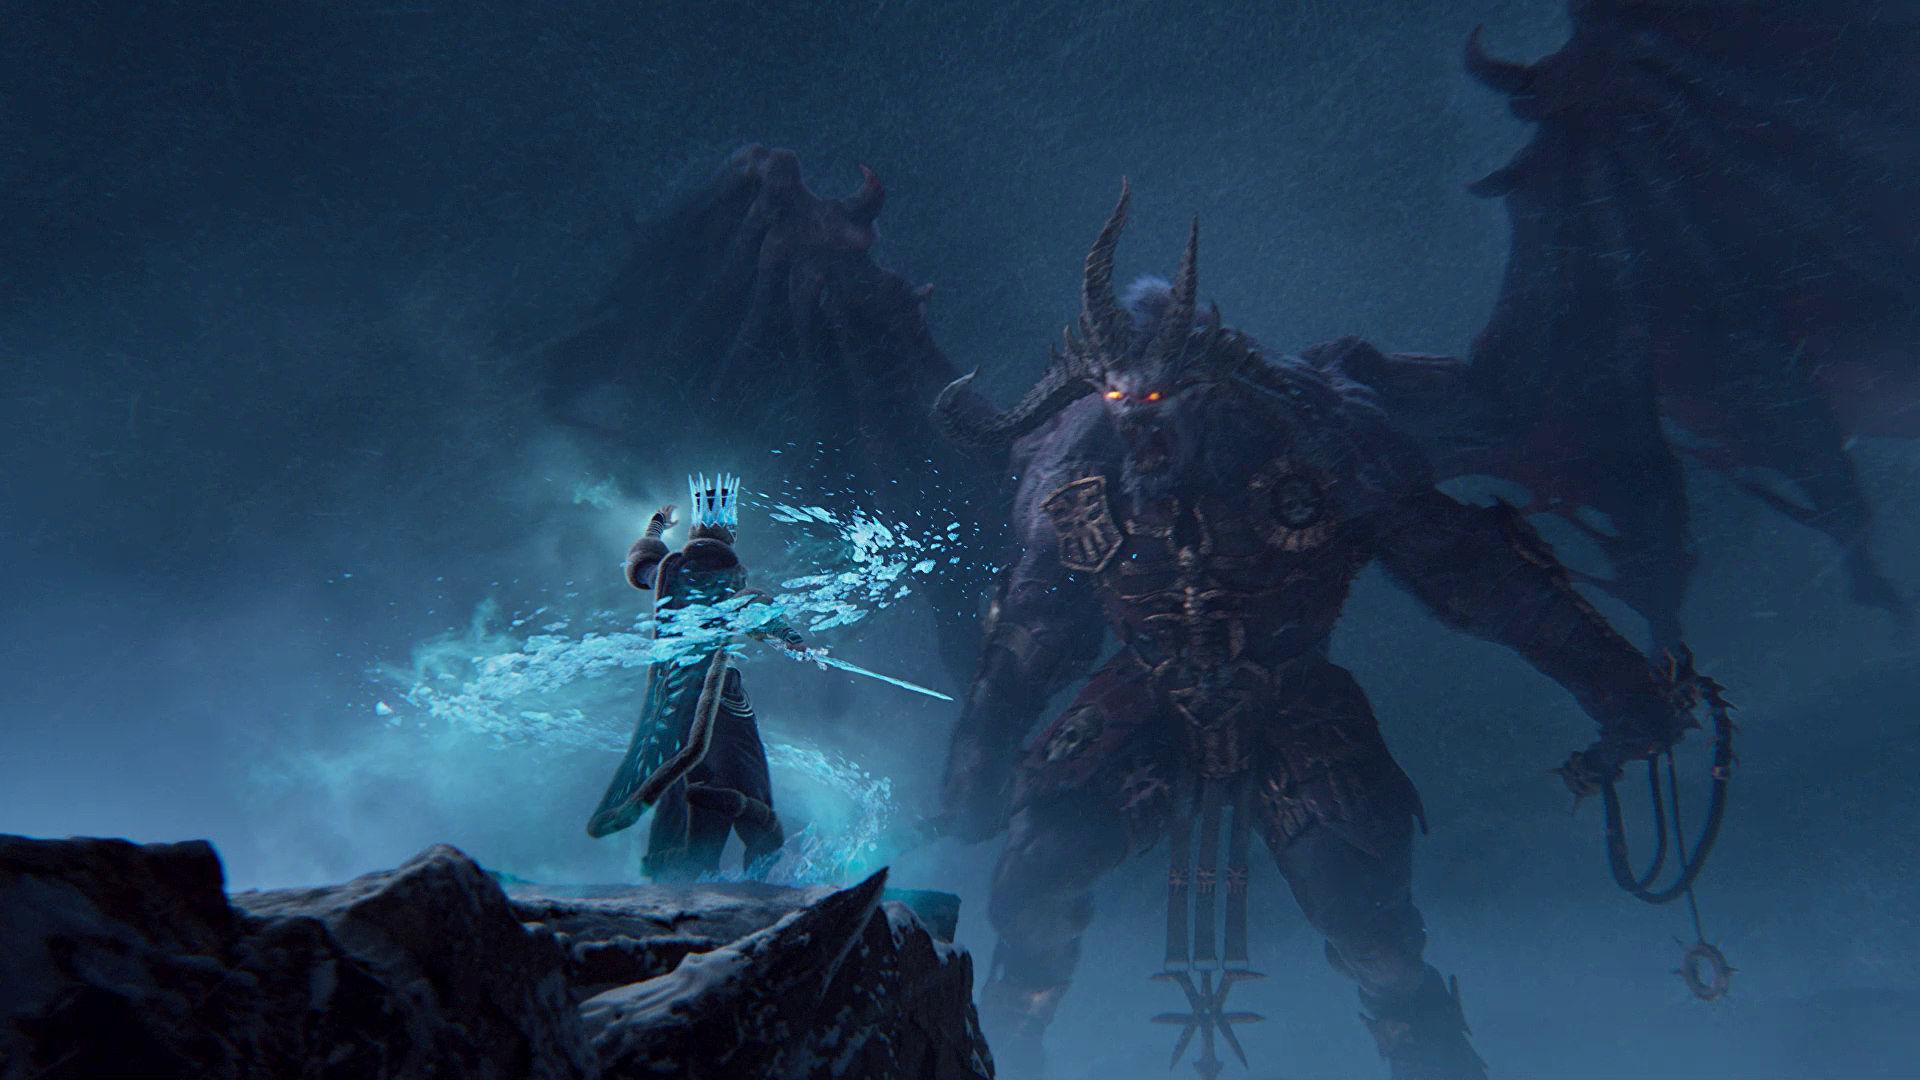 Видео: царица Катарина и боевые медведи в трейлере фракции Кислев из Total War: Warhammer III